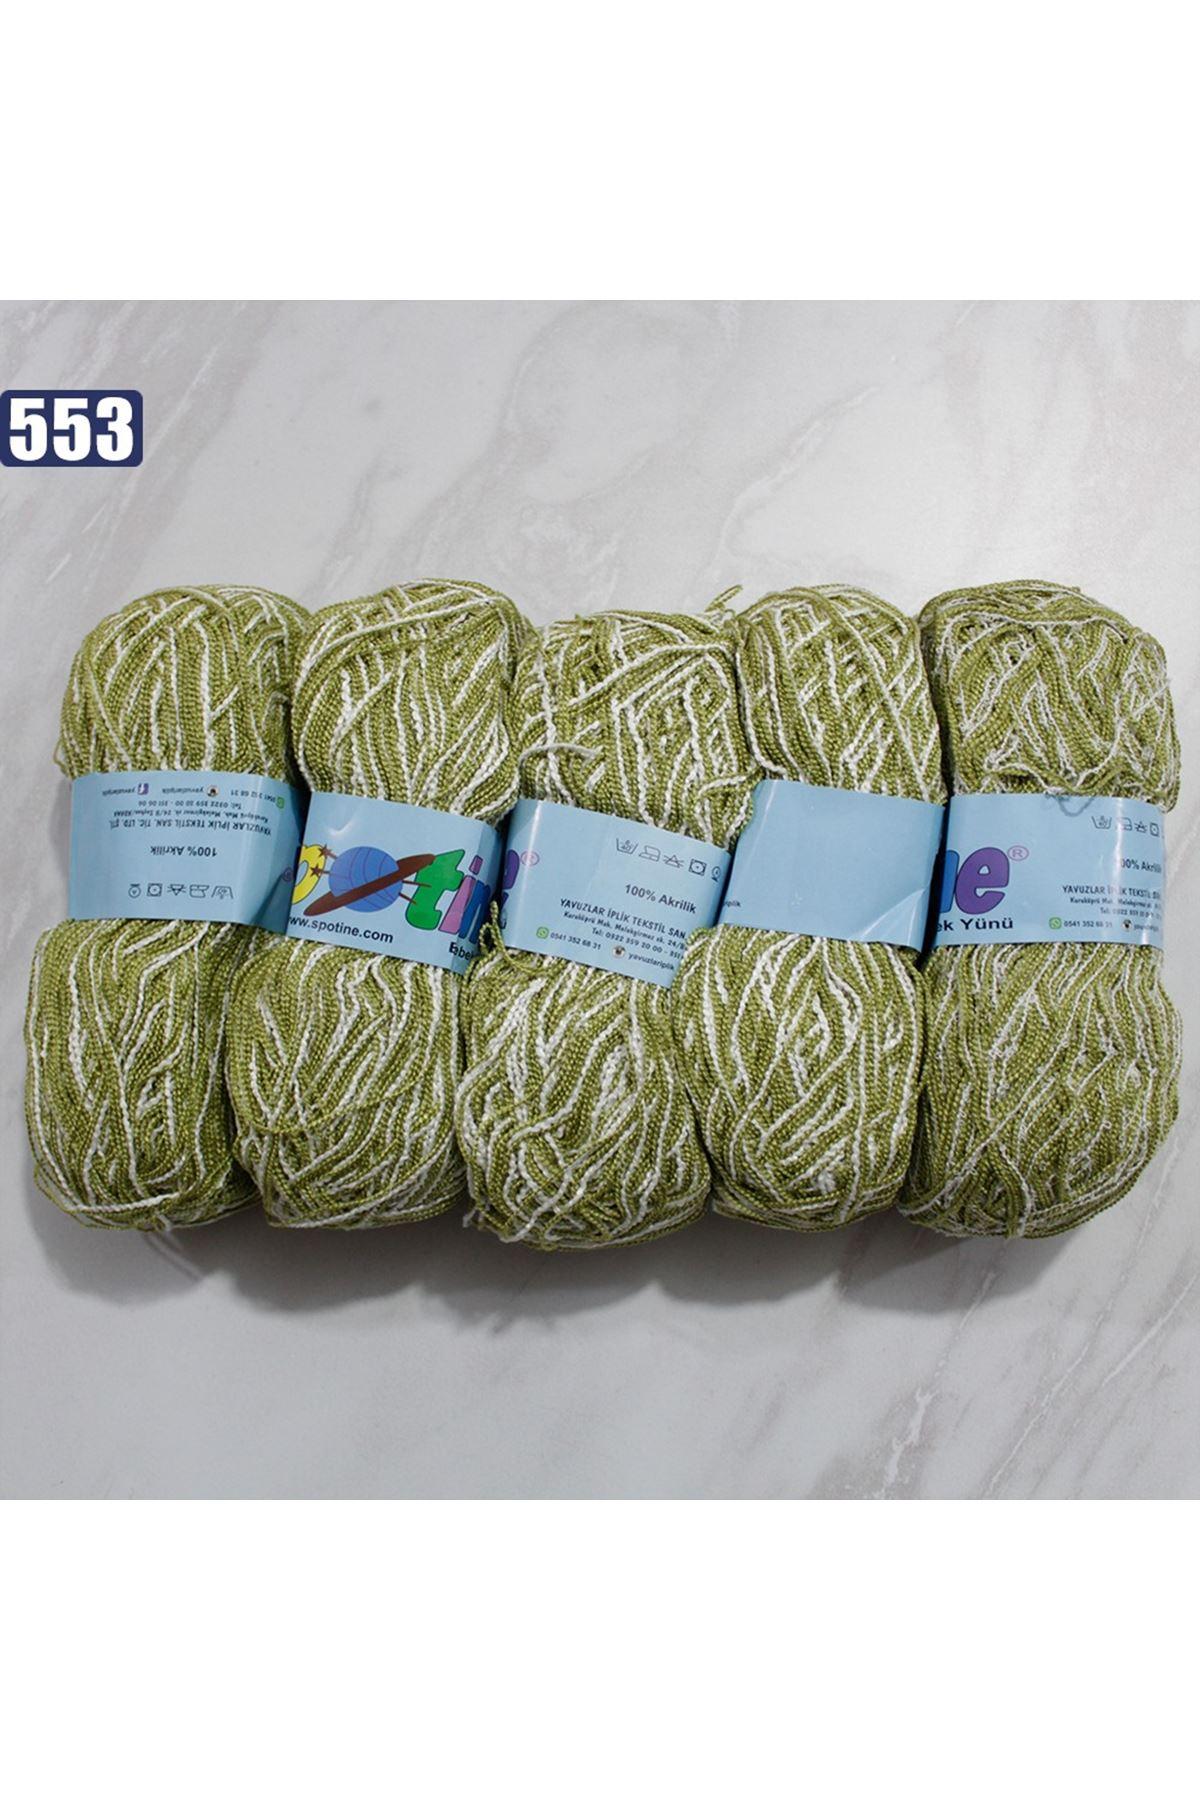 GRUP 553 - 5 ADET İP - 200 gram